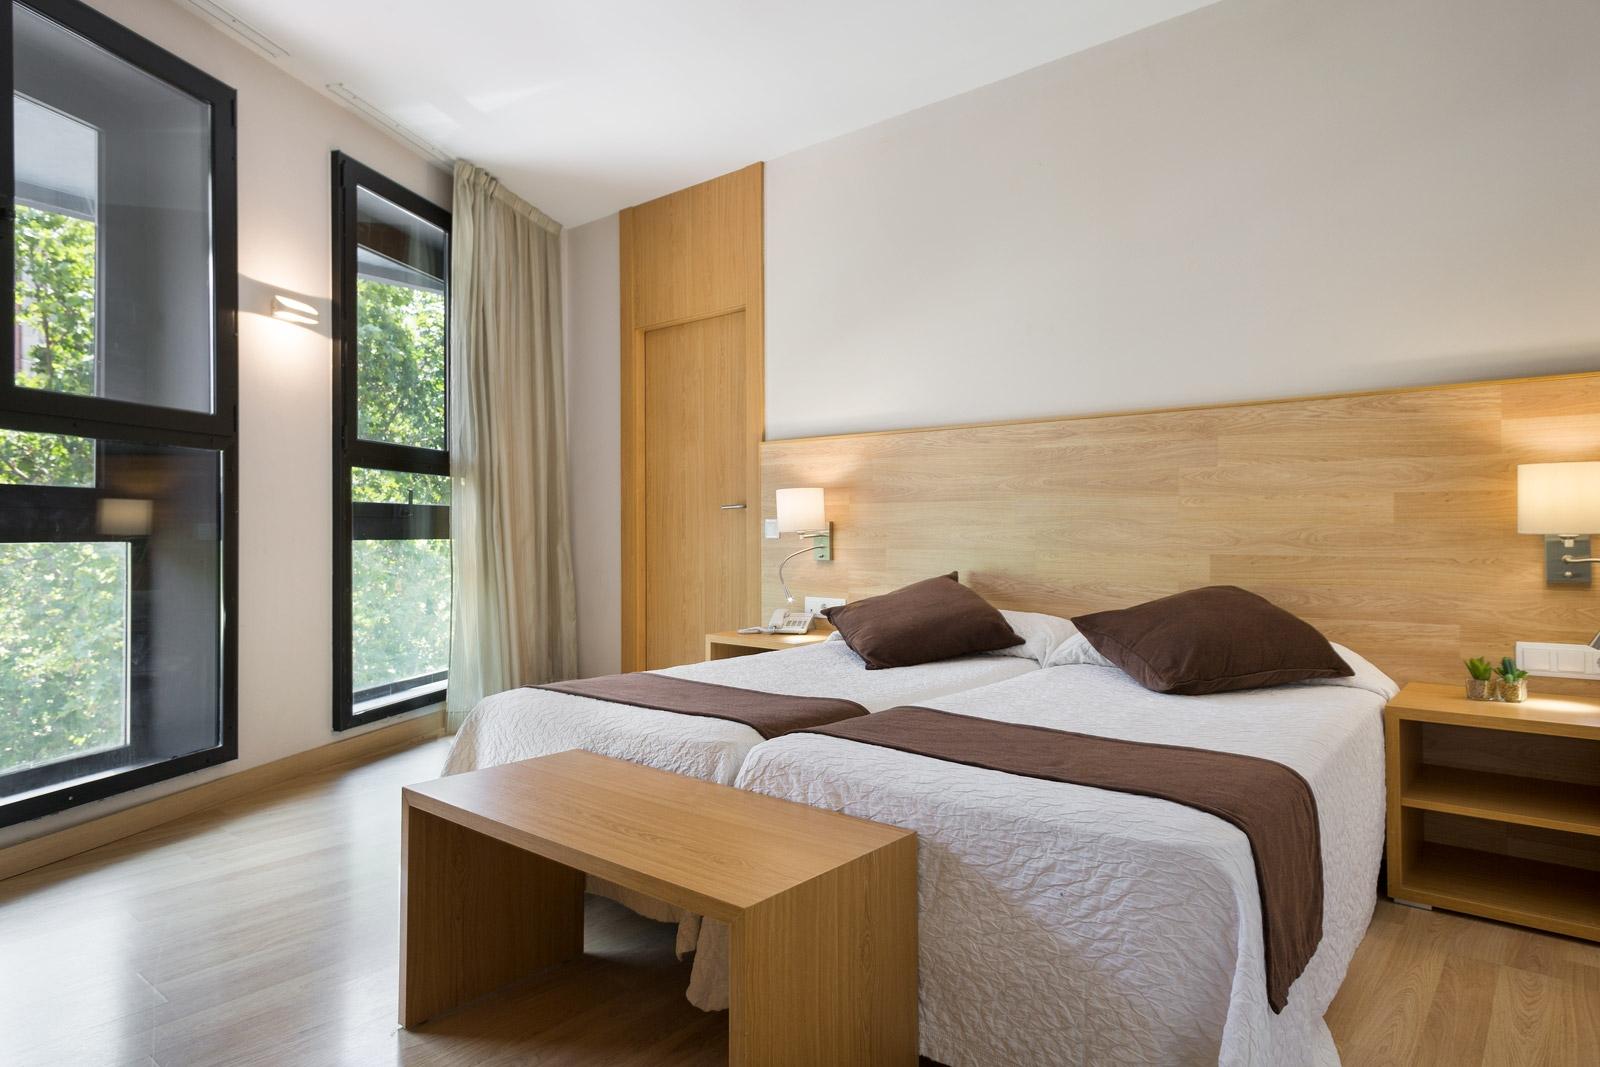 HOTEL_AZUL_HABITACIÓN_TRIPLE_CUADRUPLE_FAM4_03